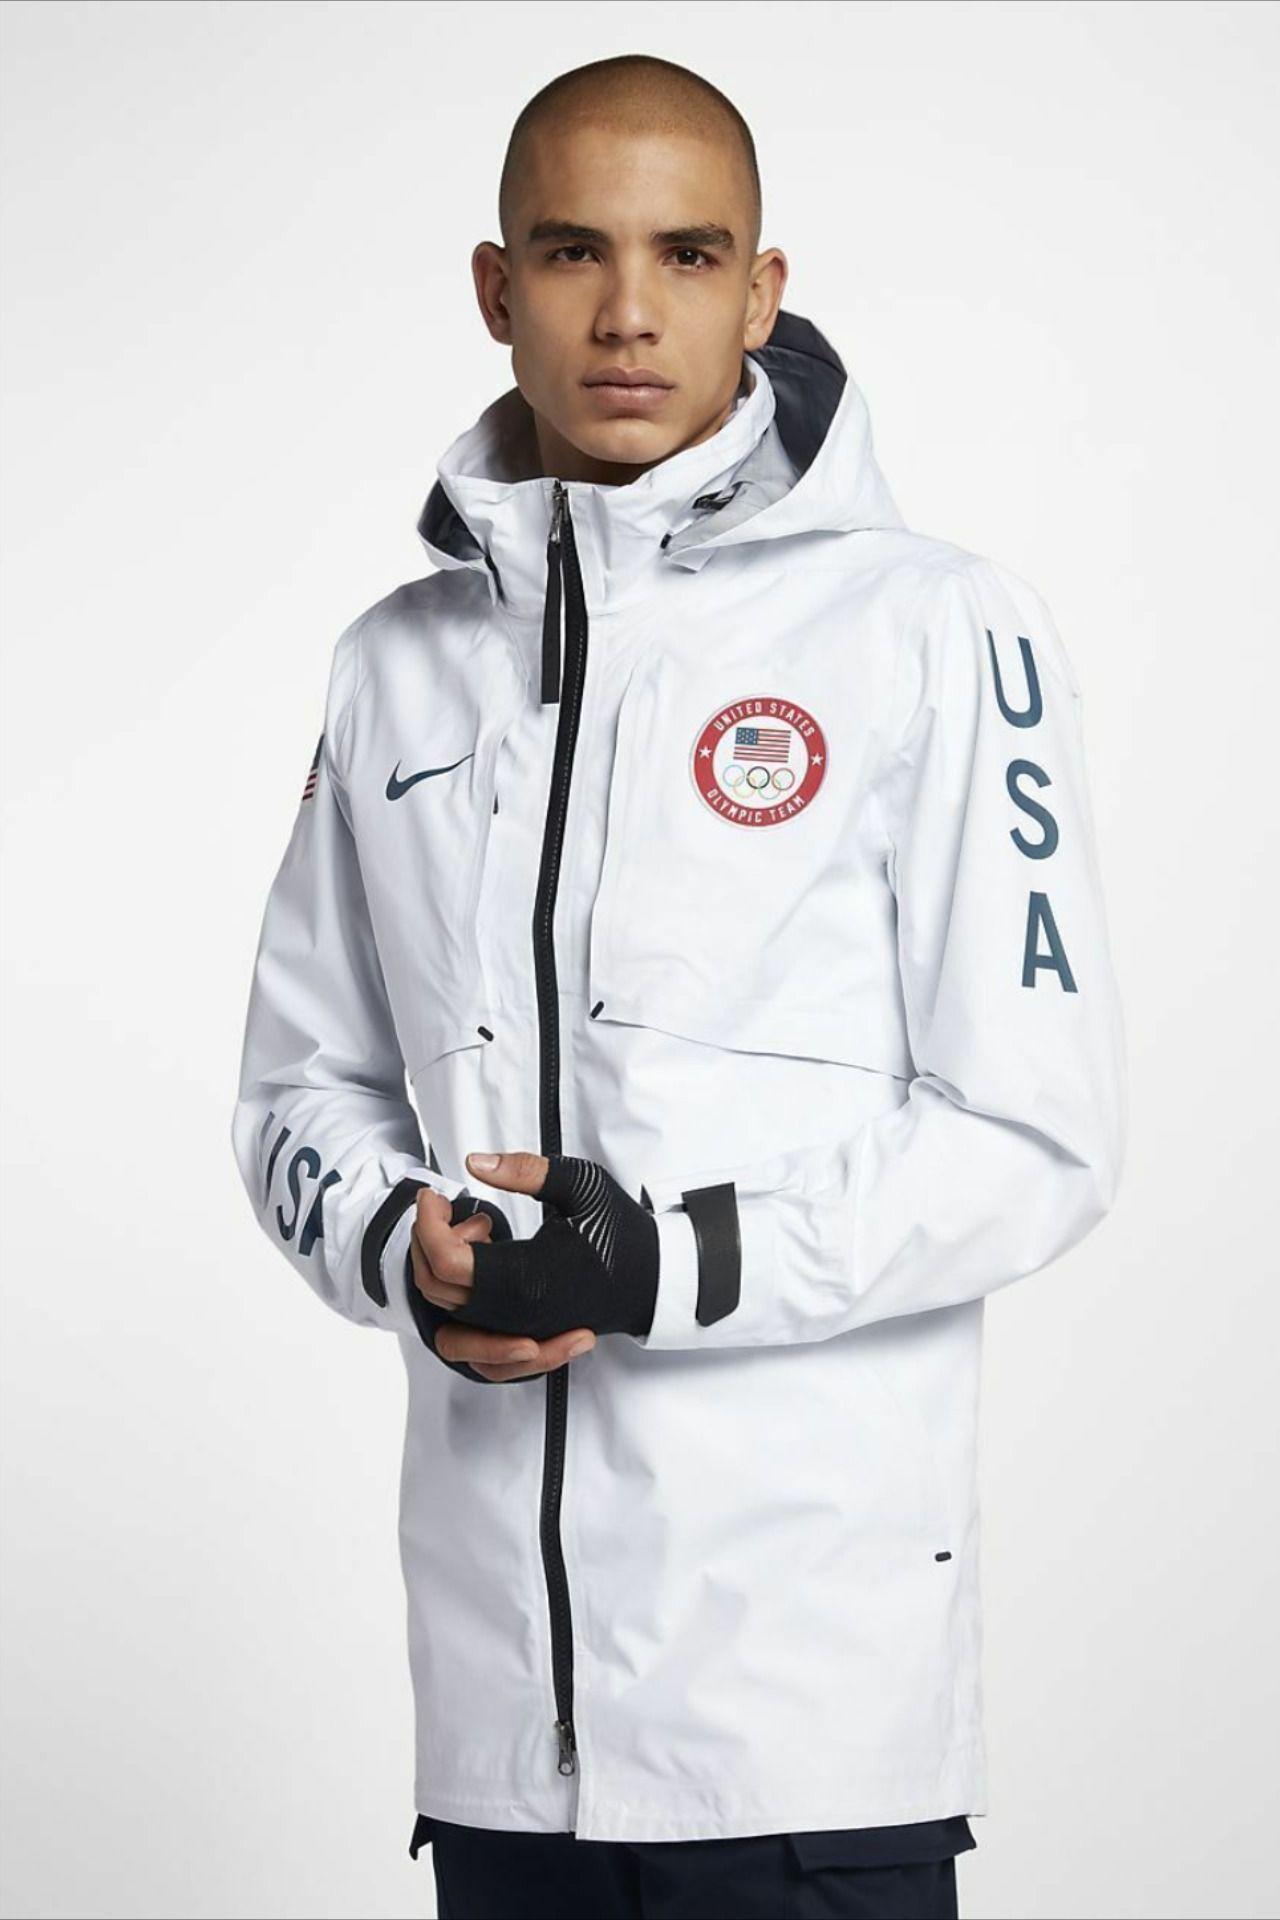 Nikelab Usa Winter Olympic Summit White Goretex Jacket Size L 916648 100 Mens Jackets Mens Nike Jacket Jackets [ 1920 x 1280 Pixel ]